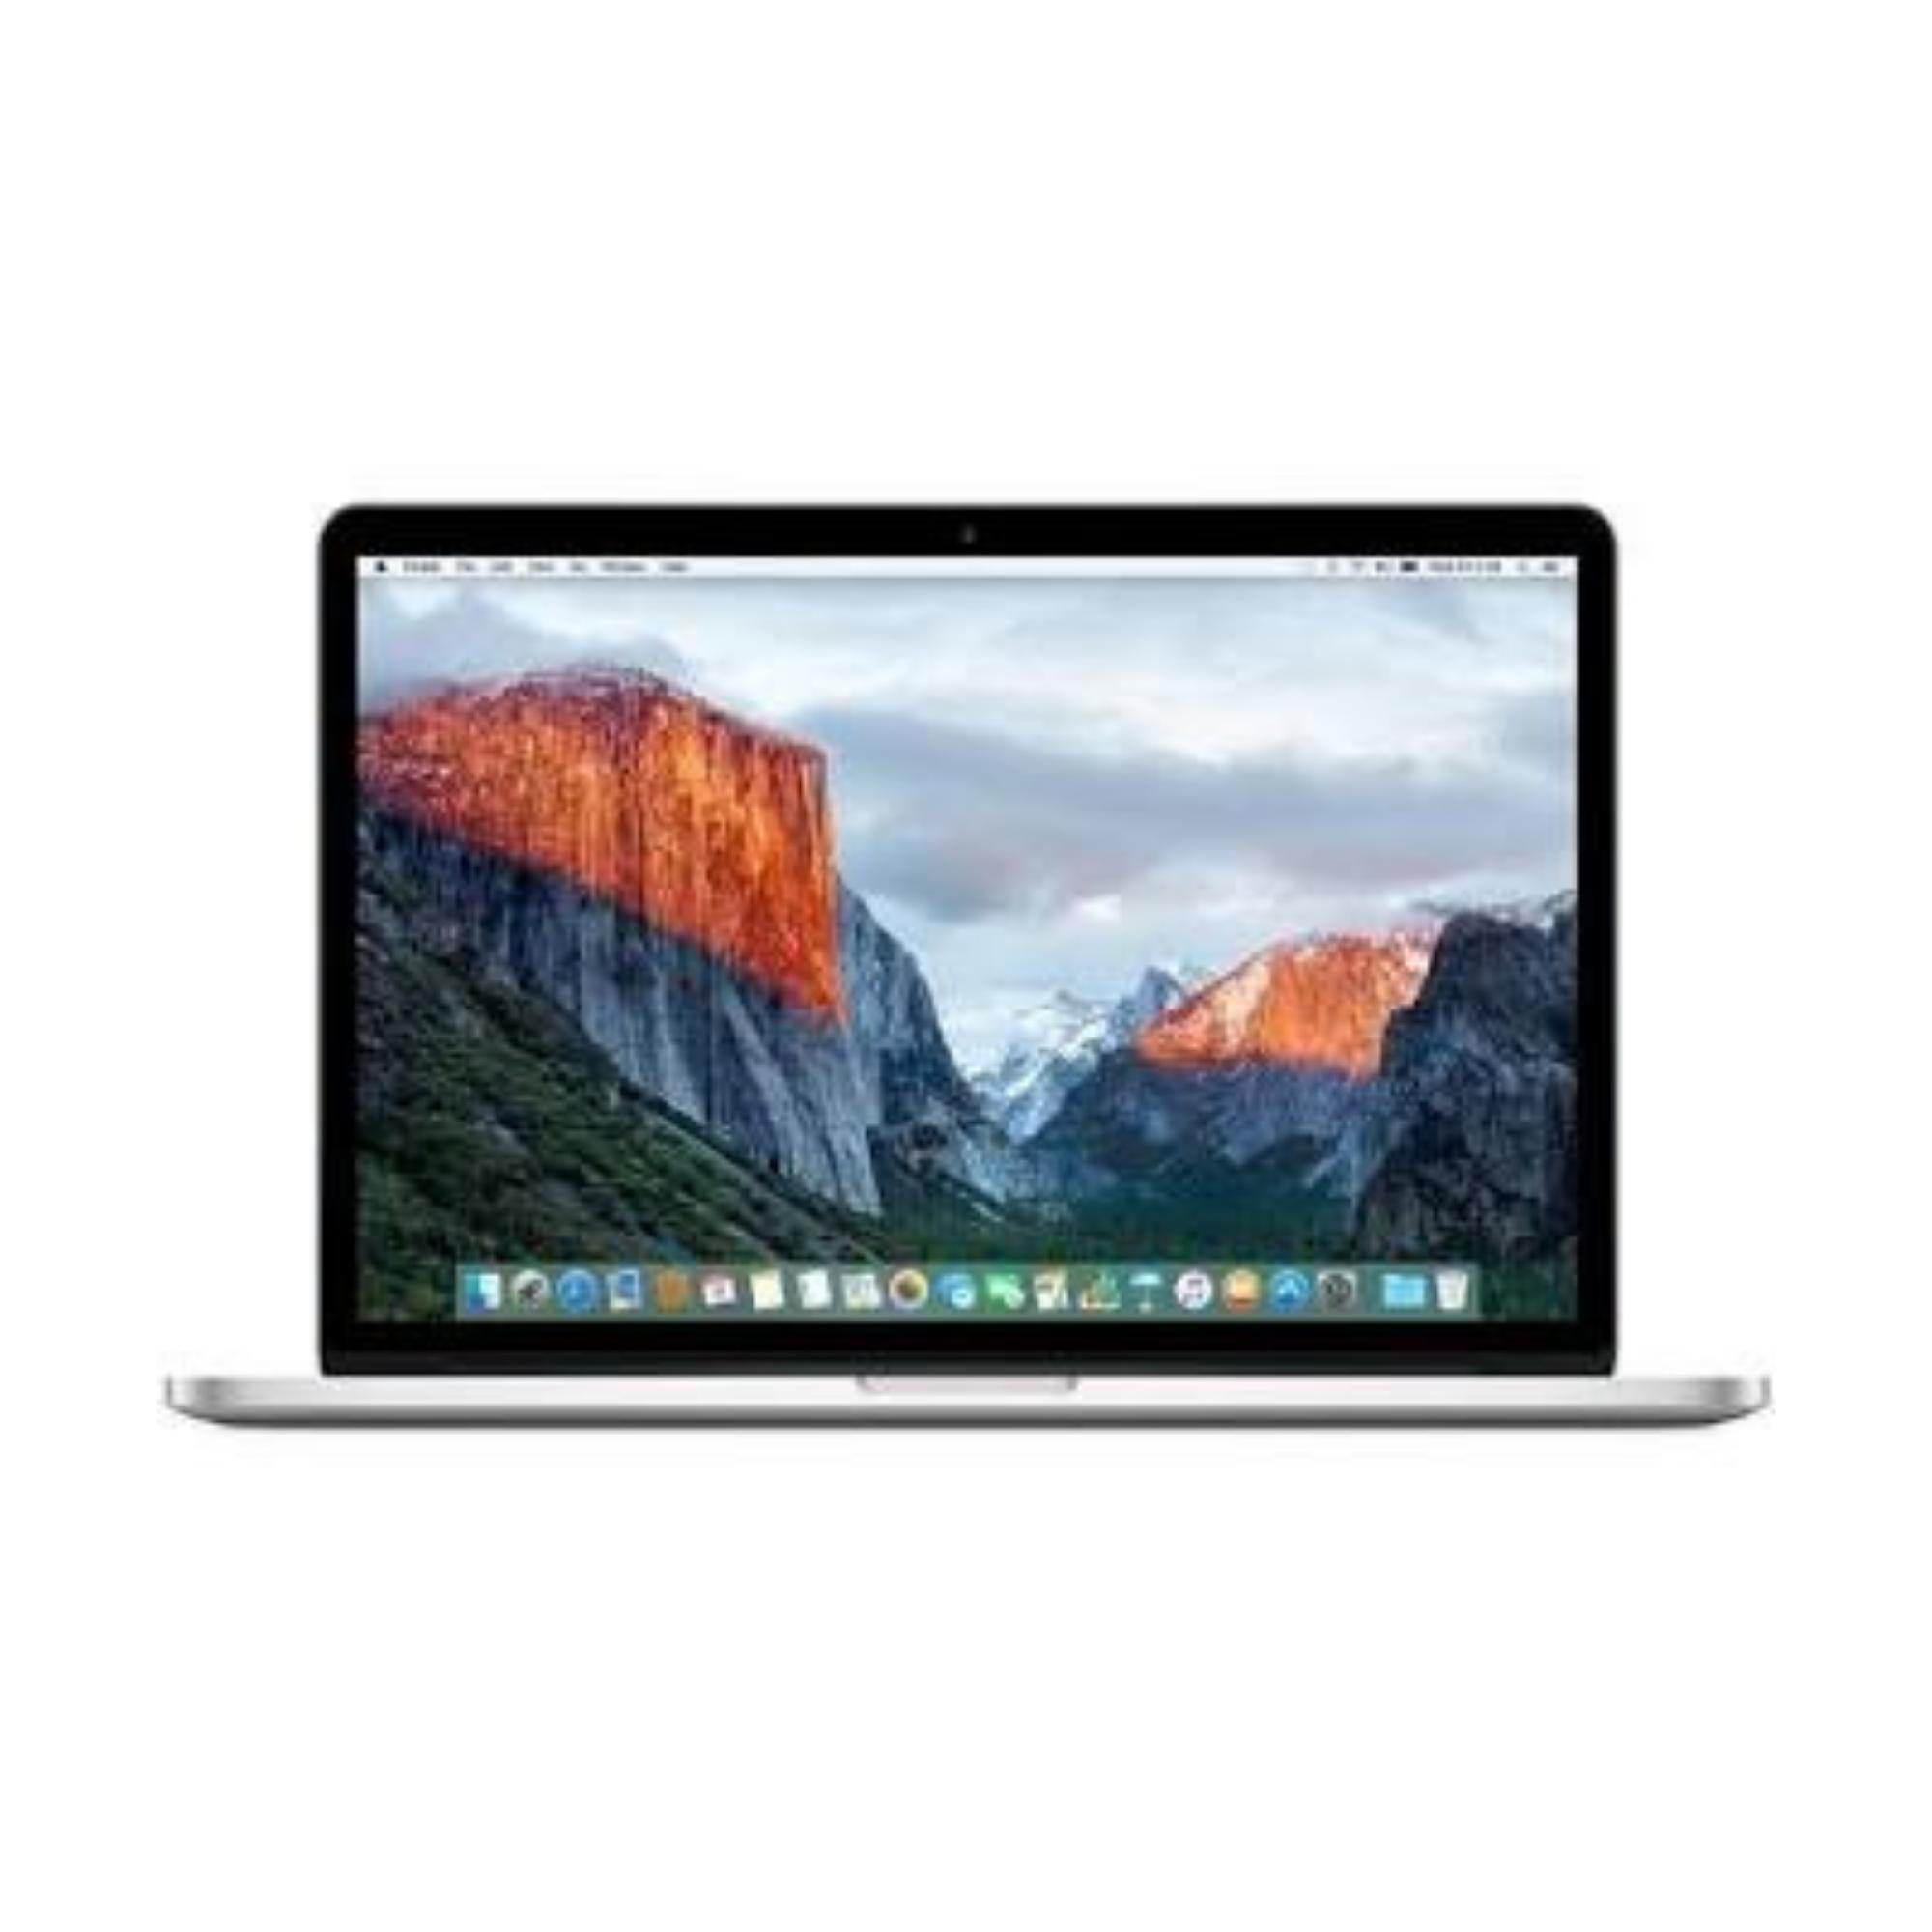 "Product: MacBook Pro 15"" Retina (2012)"